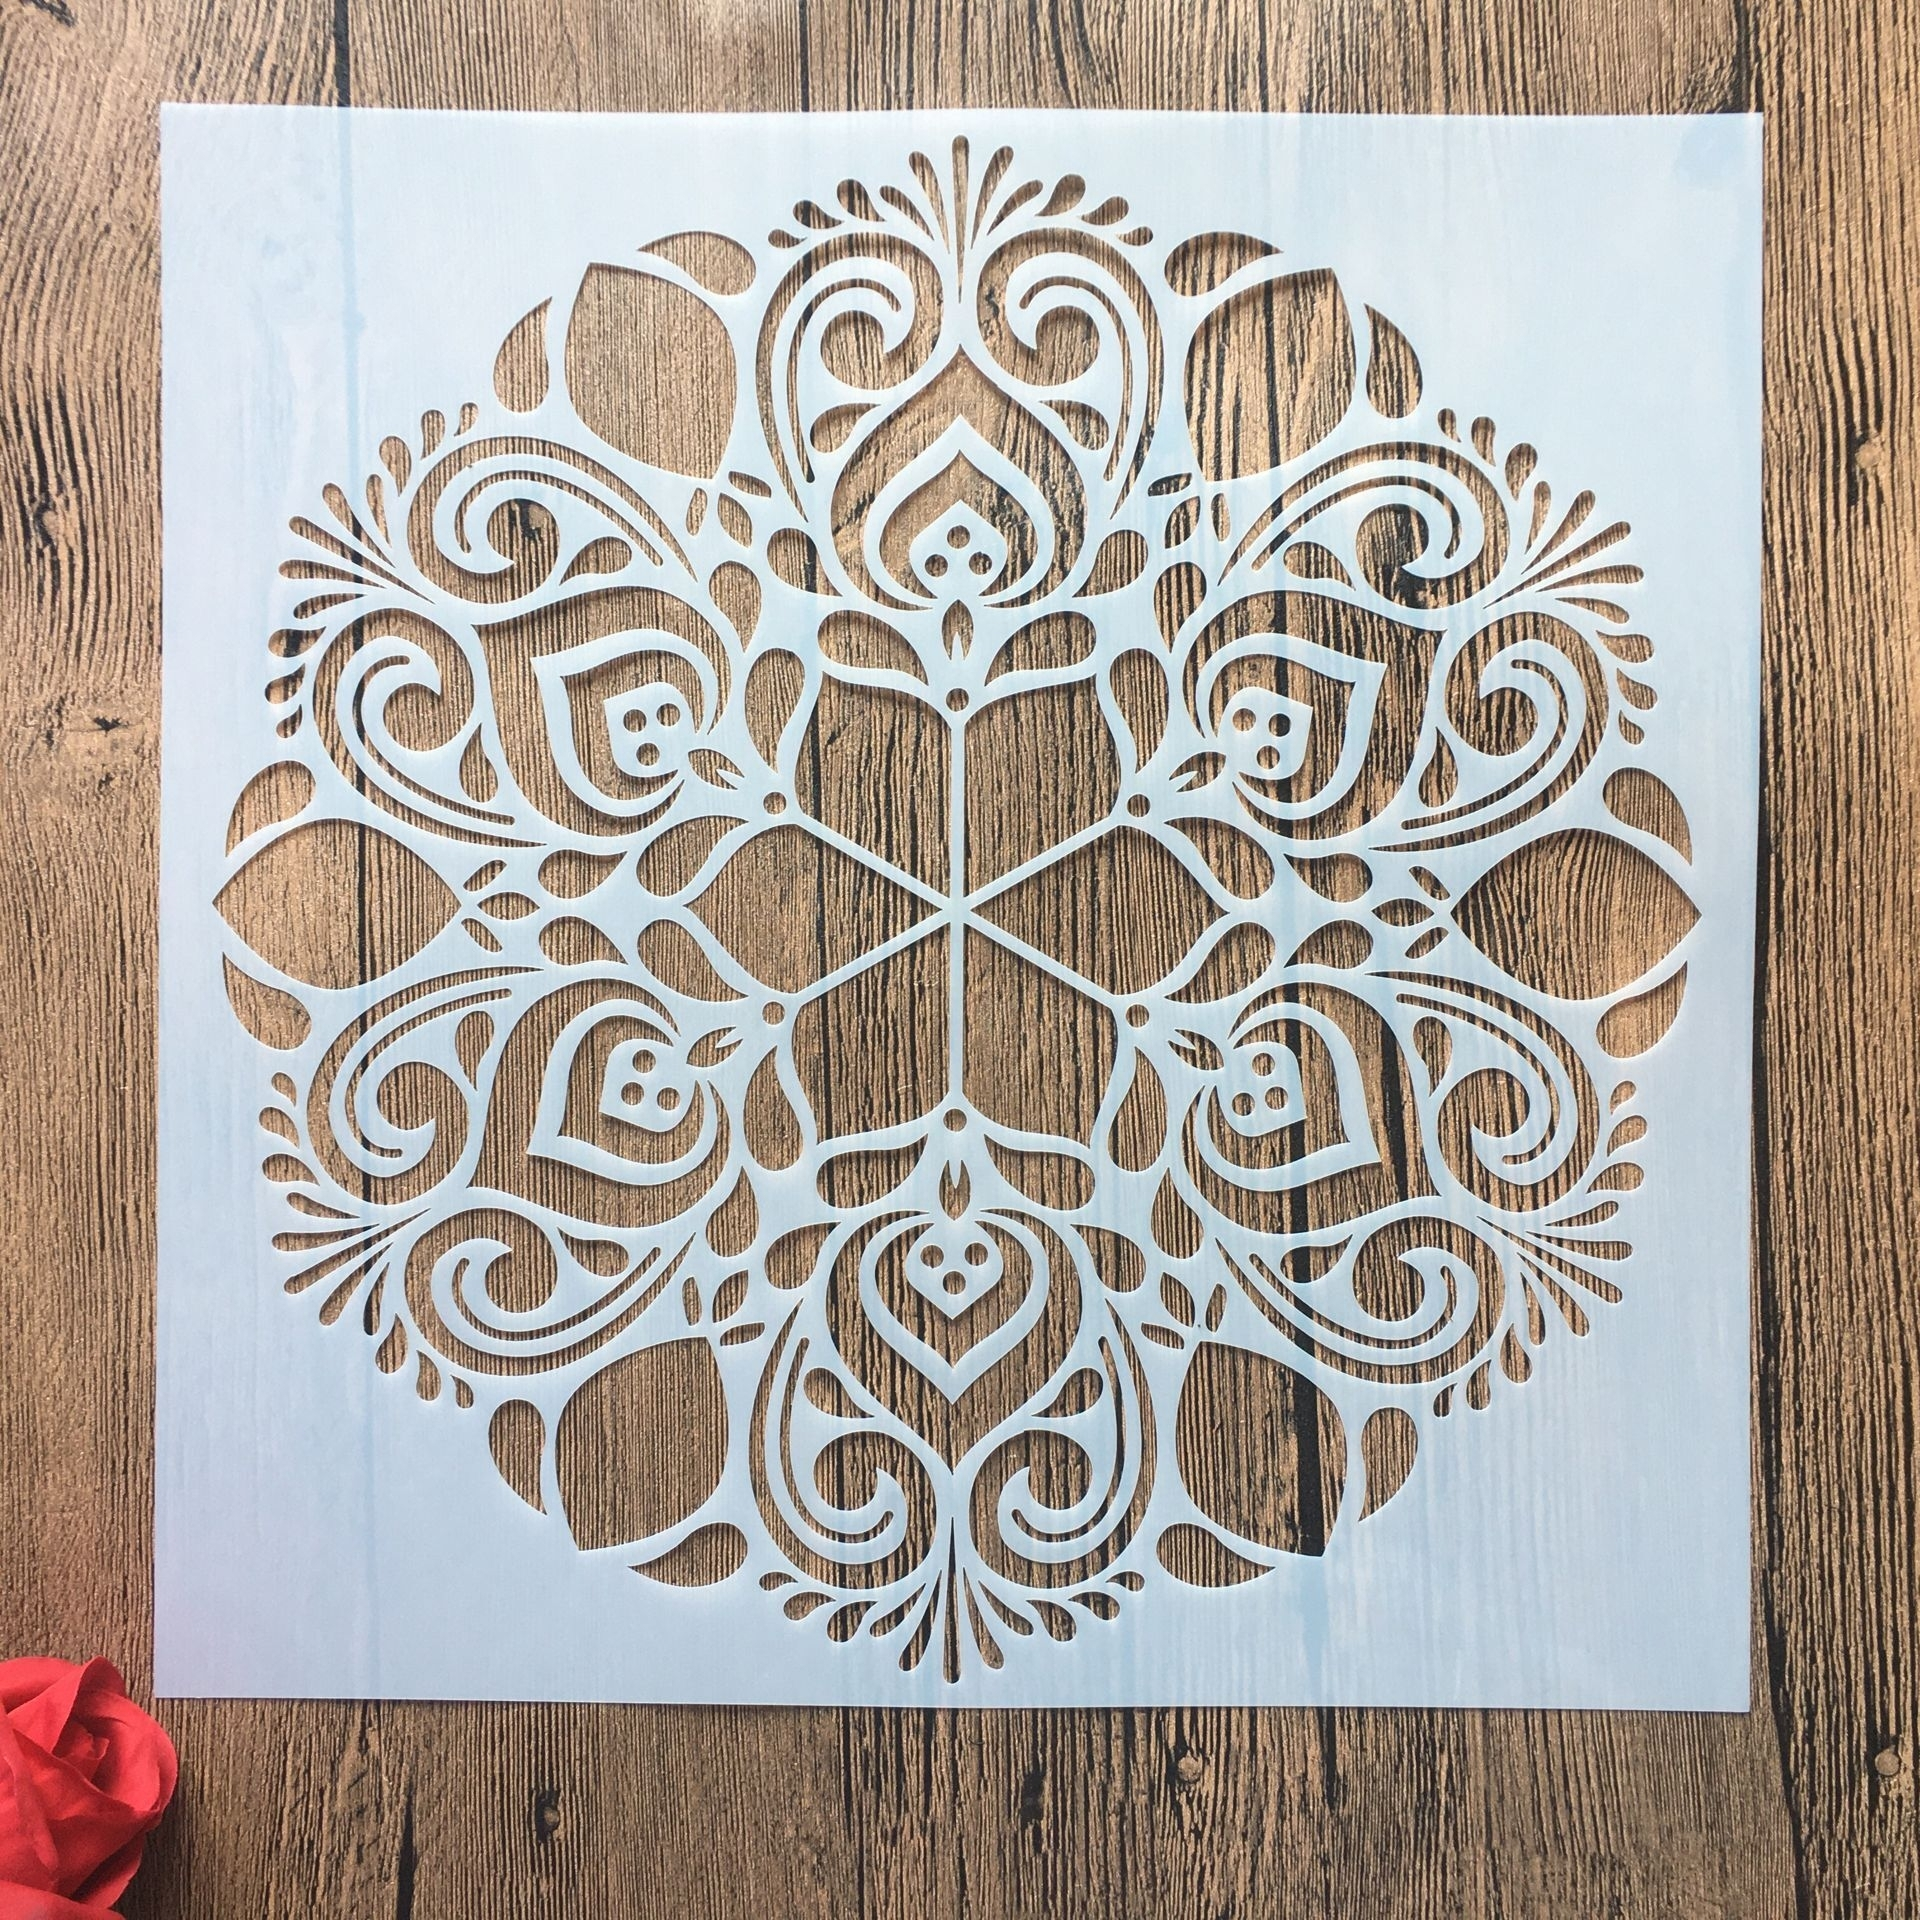 30 * 30 Cm Large Round Flower Mandala Diy Stencil Painting Scrapbook Coloring Engraving Album Decoration Template Stencil